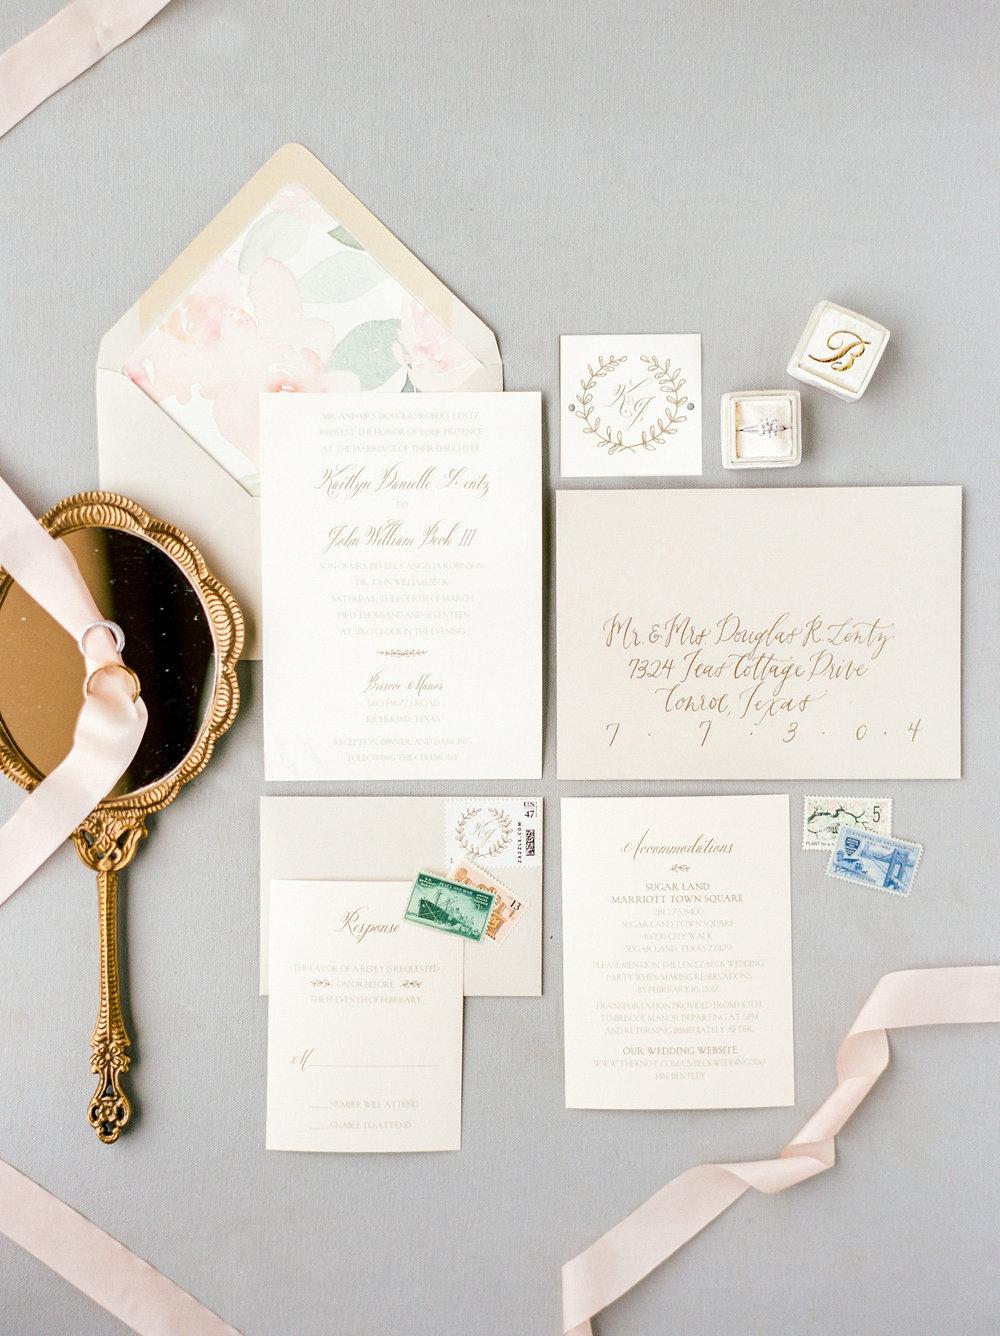 Briscoe-Manor-Houston-Wedding-Photographer-Modern-Luxury-Weddings-Dana-Fernandez-Photograpy-Fine-Art-Photographer-Houston-Film-Destination-PNW-Wedding-Photographer-1.jpg